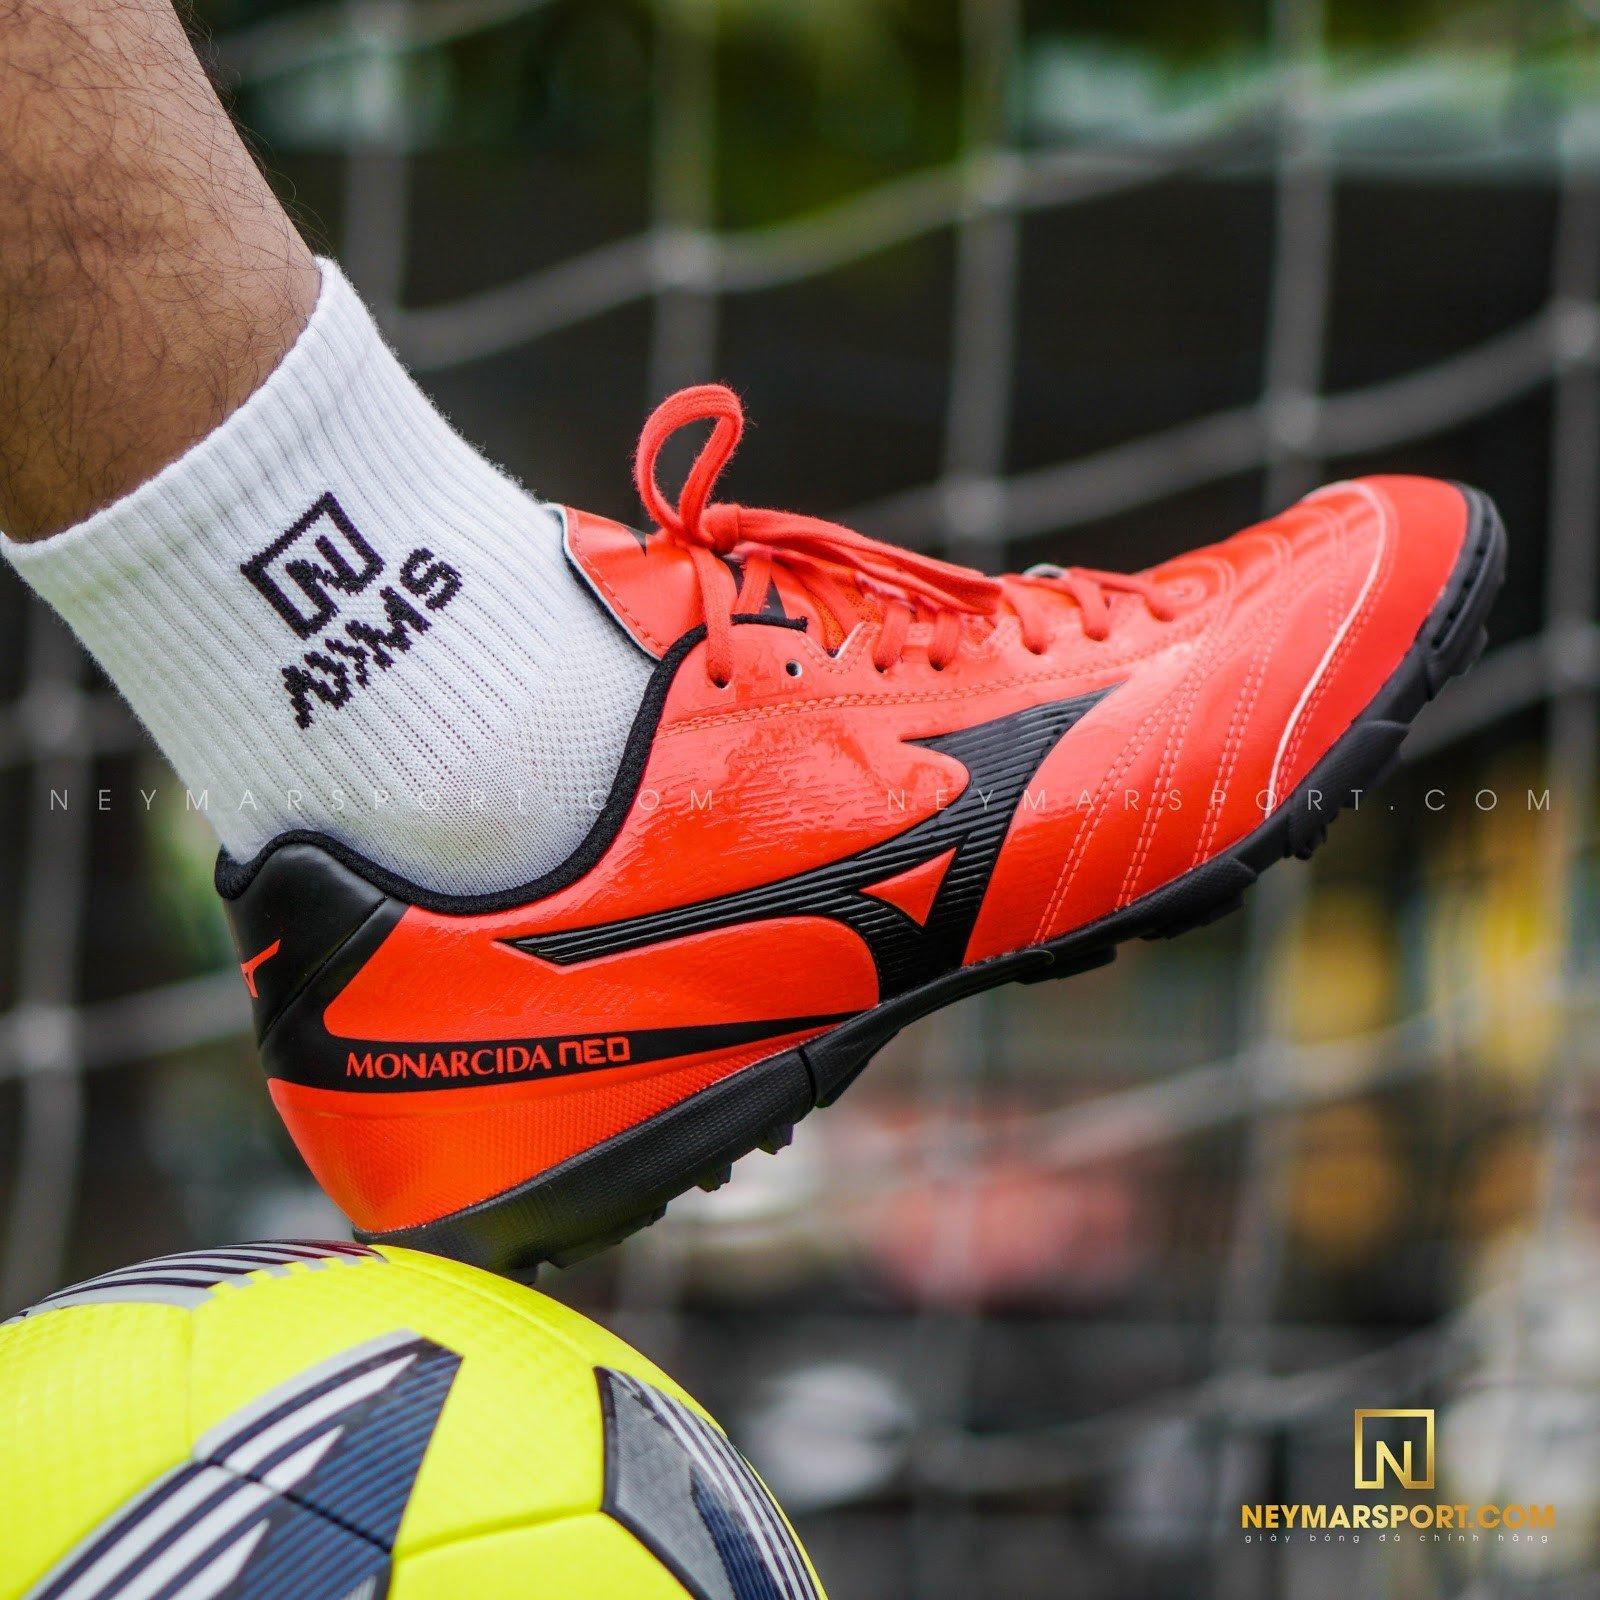 Giày đá bóng Mizuno Monarcida Neo Sala Select